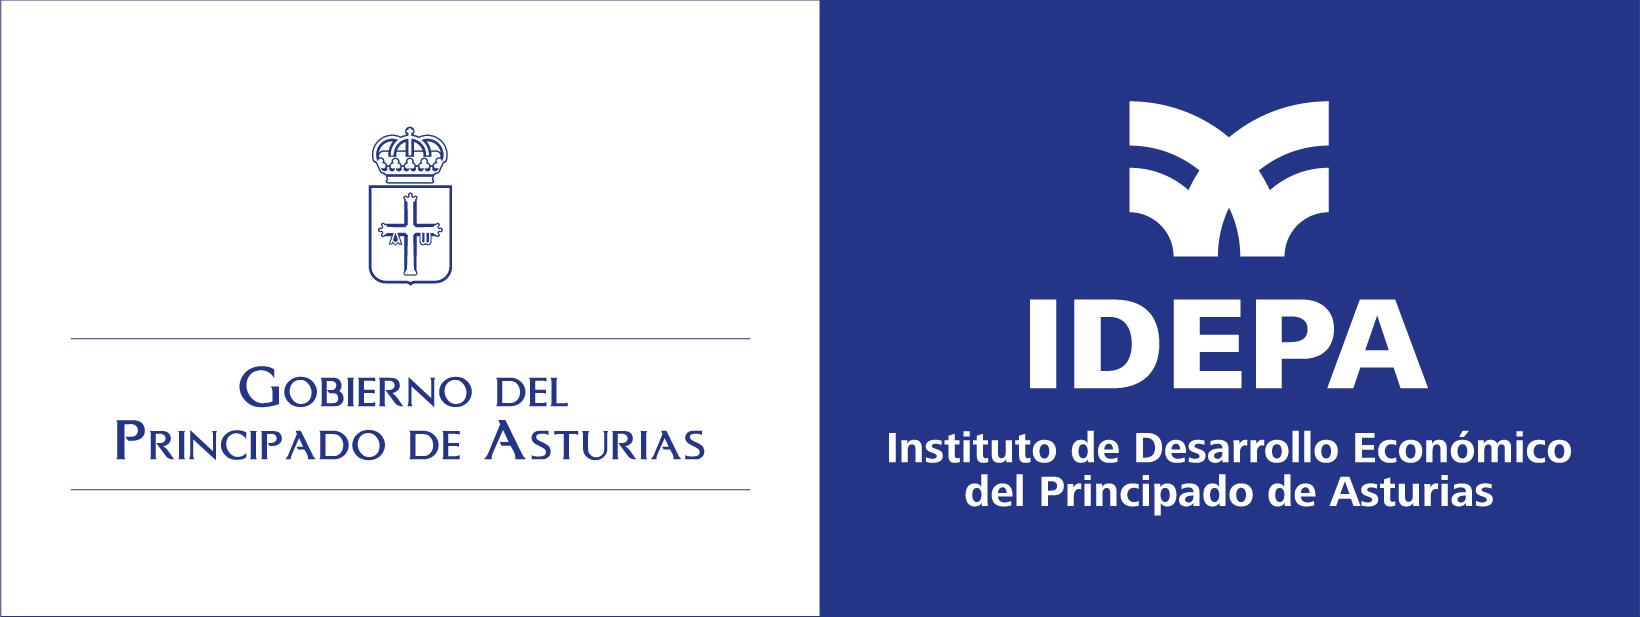 IDEPA Logo